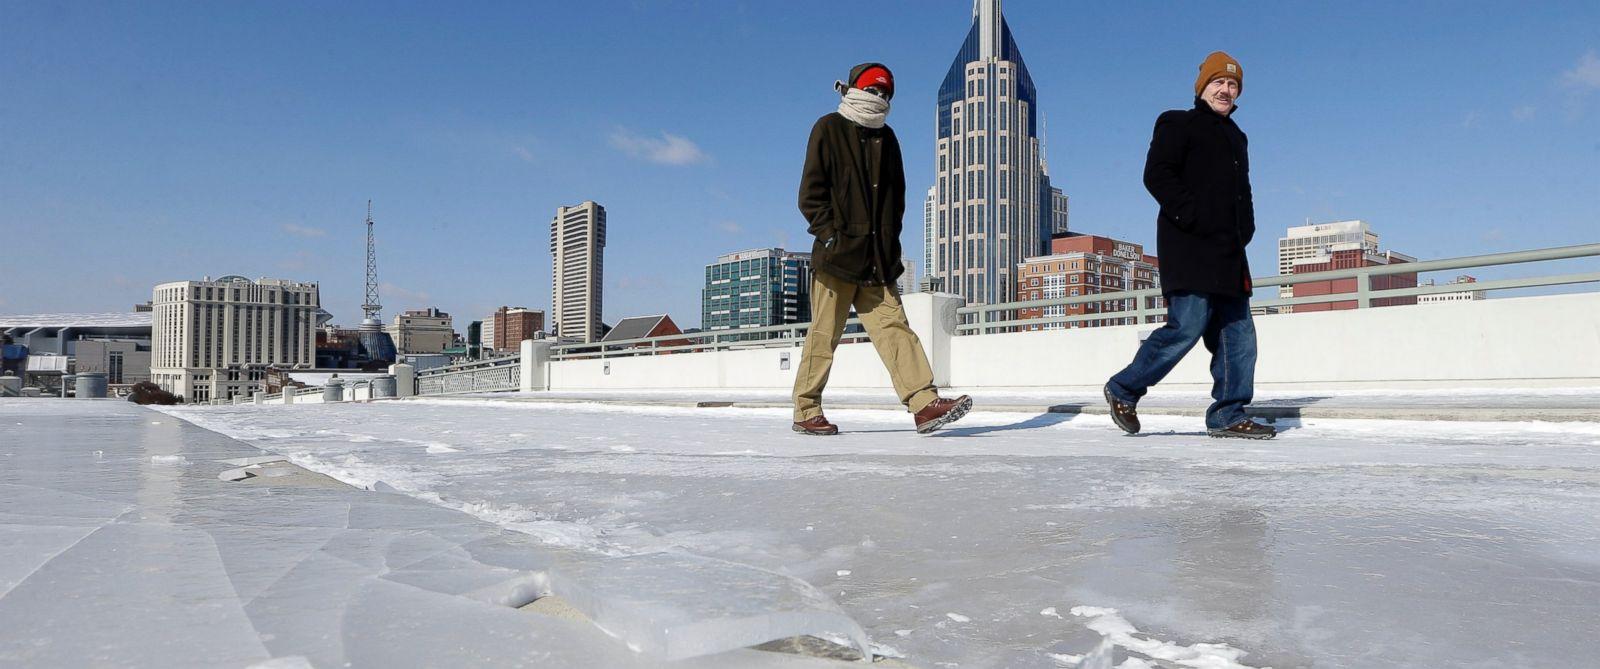 PHOTO: Austin Carlson, left, and Jim Post, of Jamestown, New York, walk across an ice-covered bridge on Feb. 19, 2015, in Nashville, Tenn.